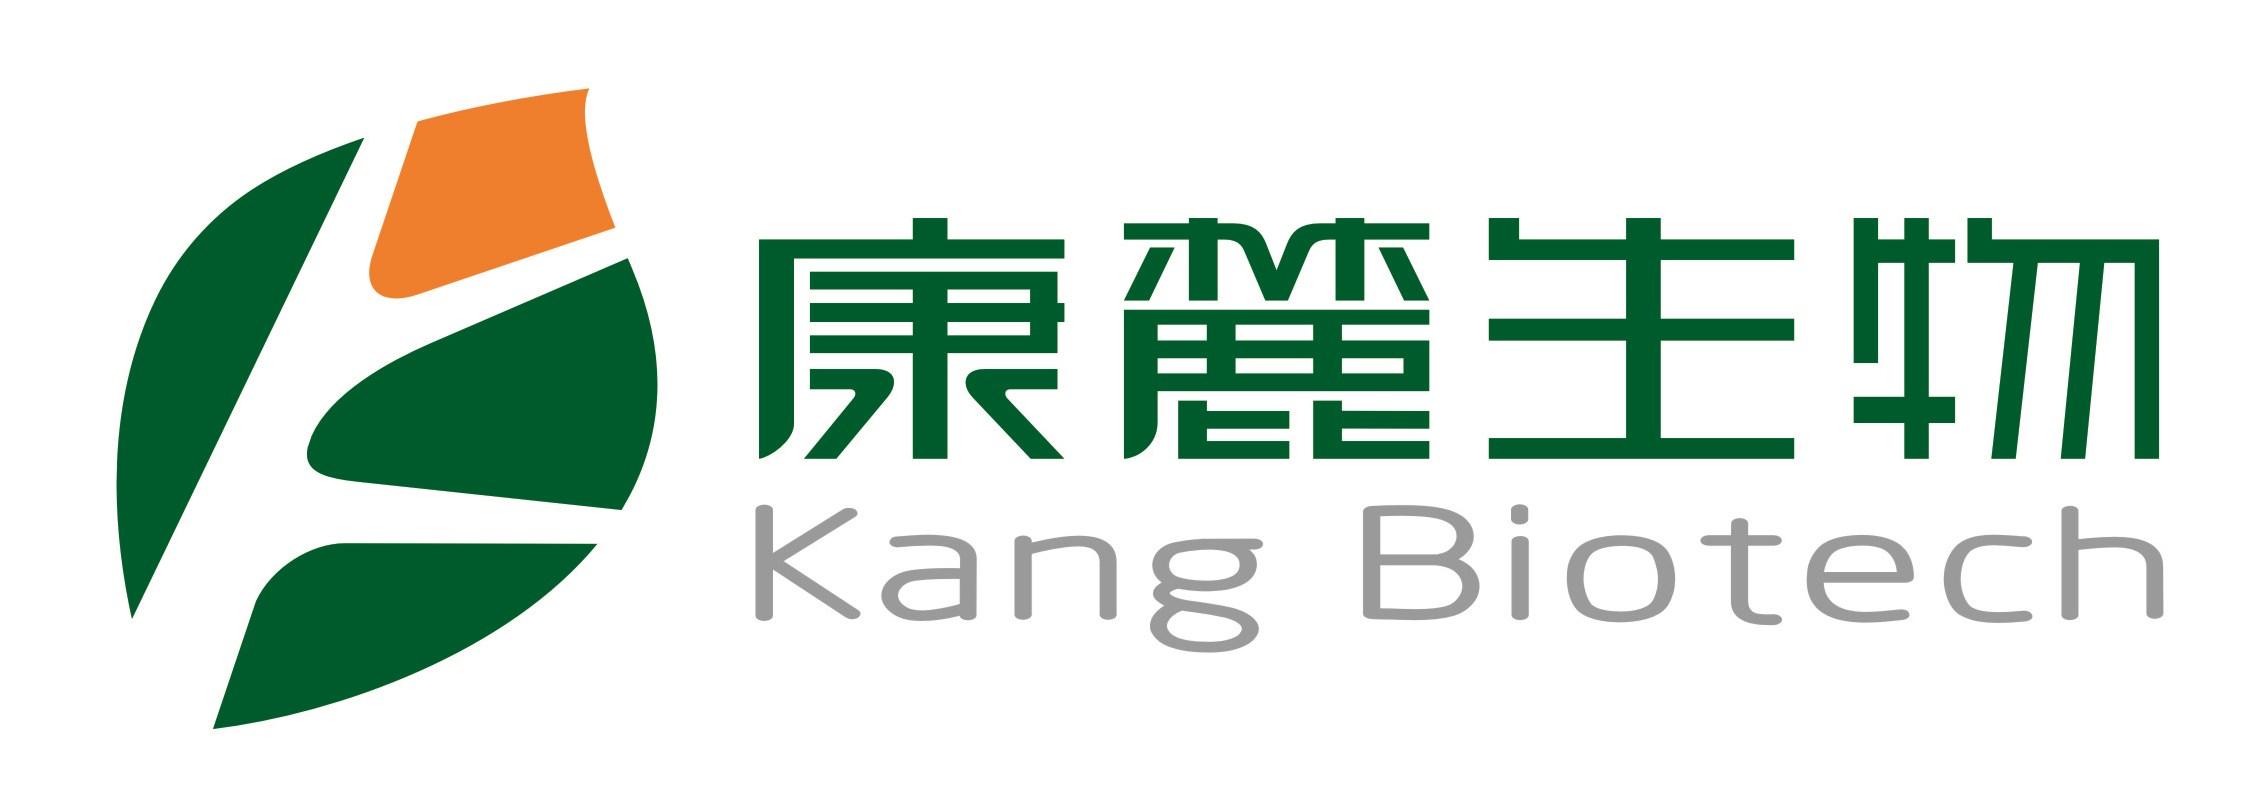 Hunan Kangbiotech Co., Ltd.